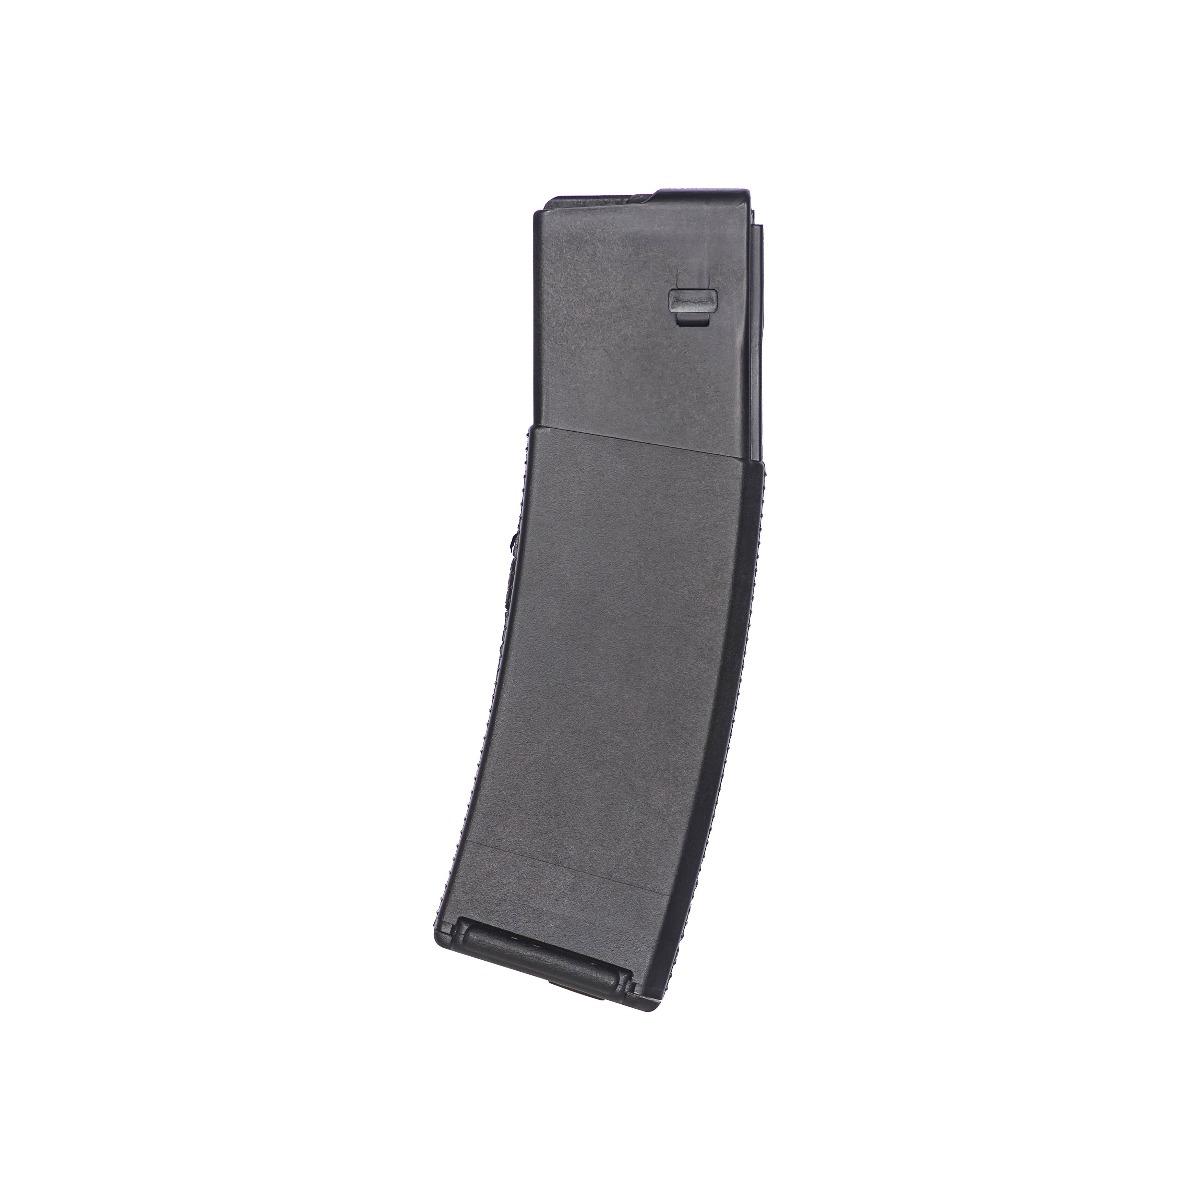 TorkMag Dual-Spring AR-15 Magazine - Black | 40rd